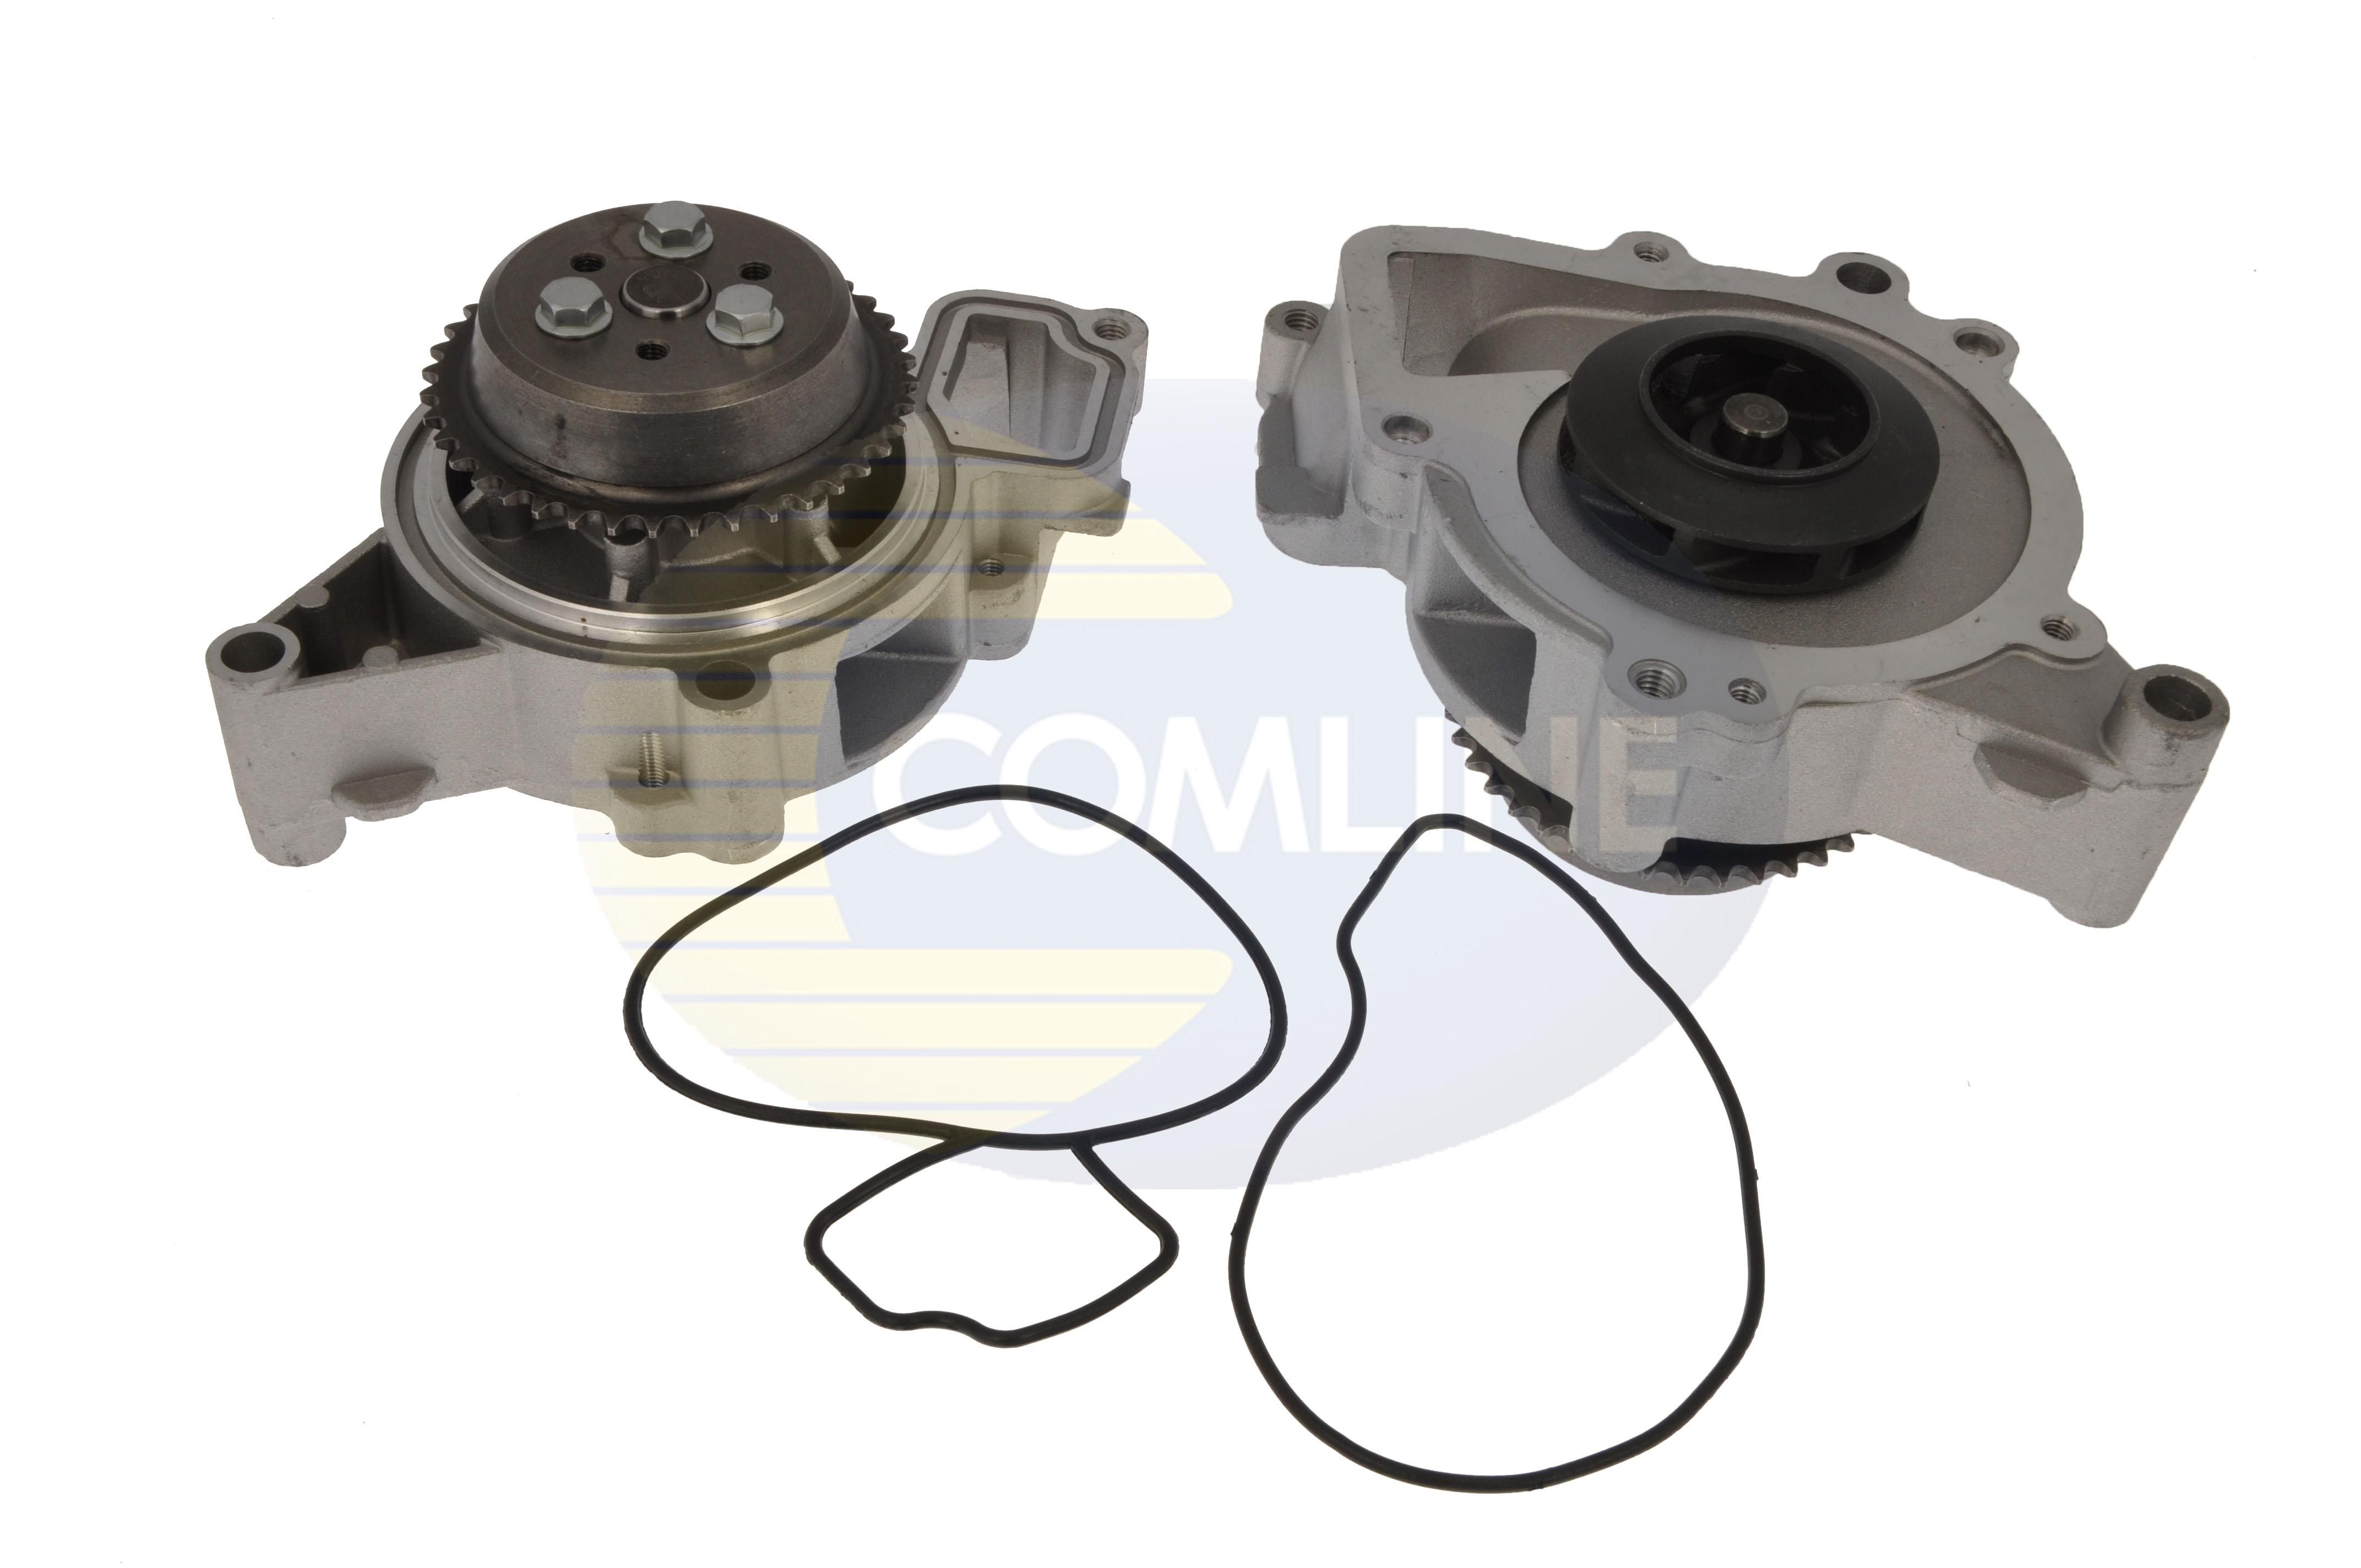 Water Pump Replacement : Service manual replace water pump alfa romeo spider